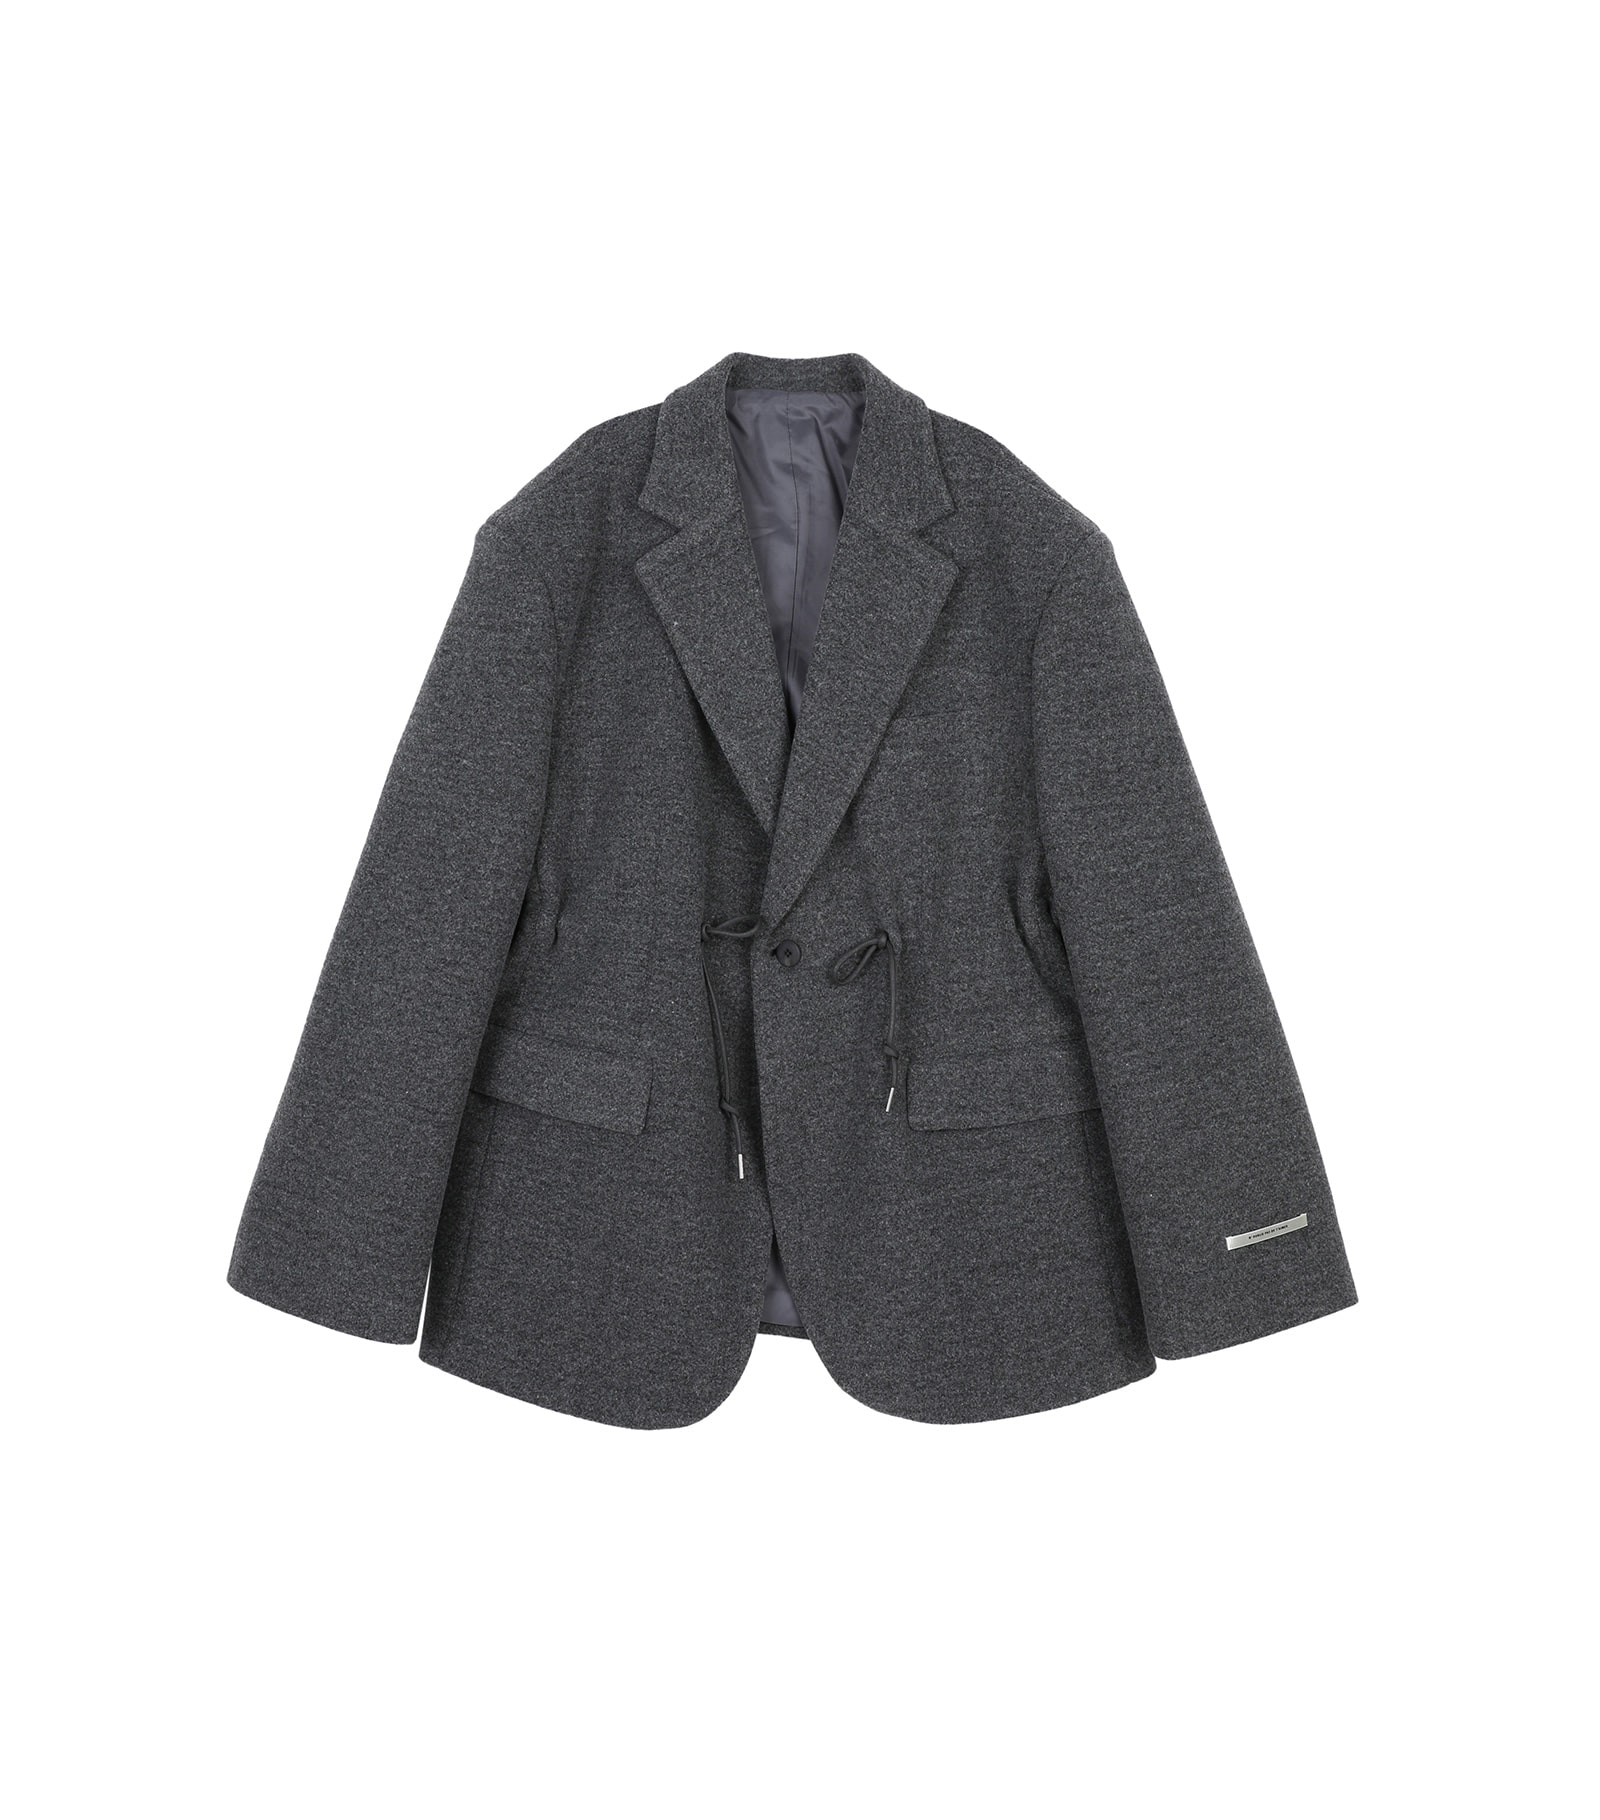 Hiber string unisex wool blazer